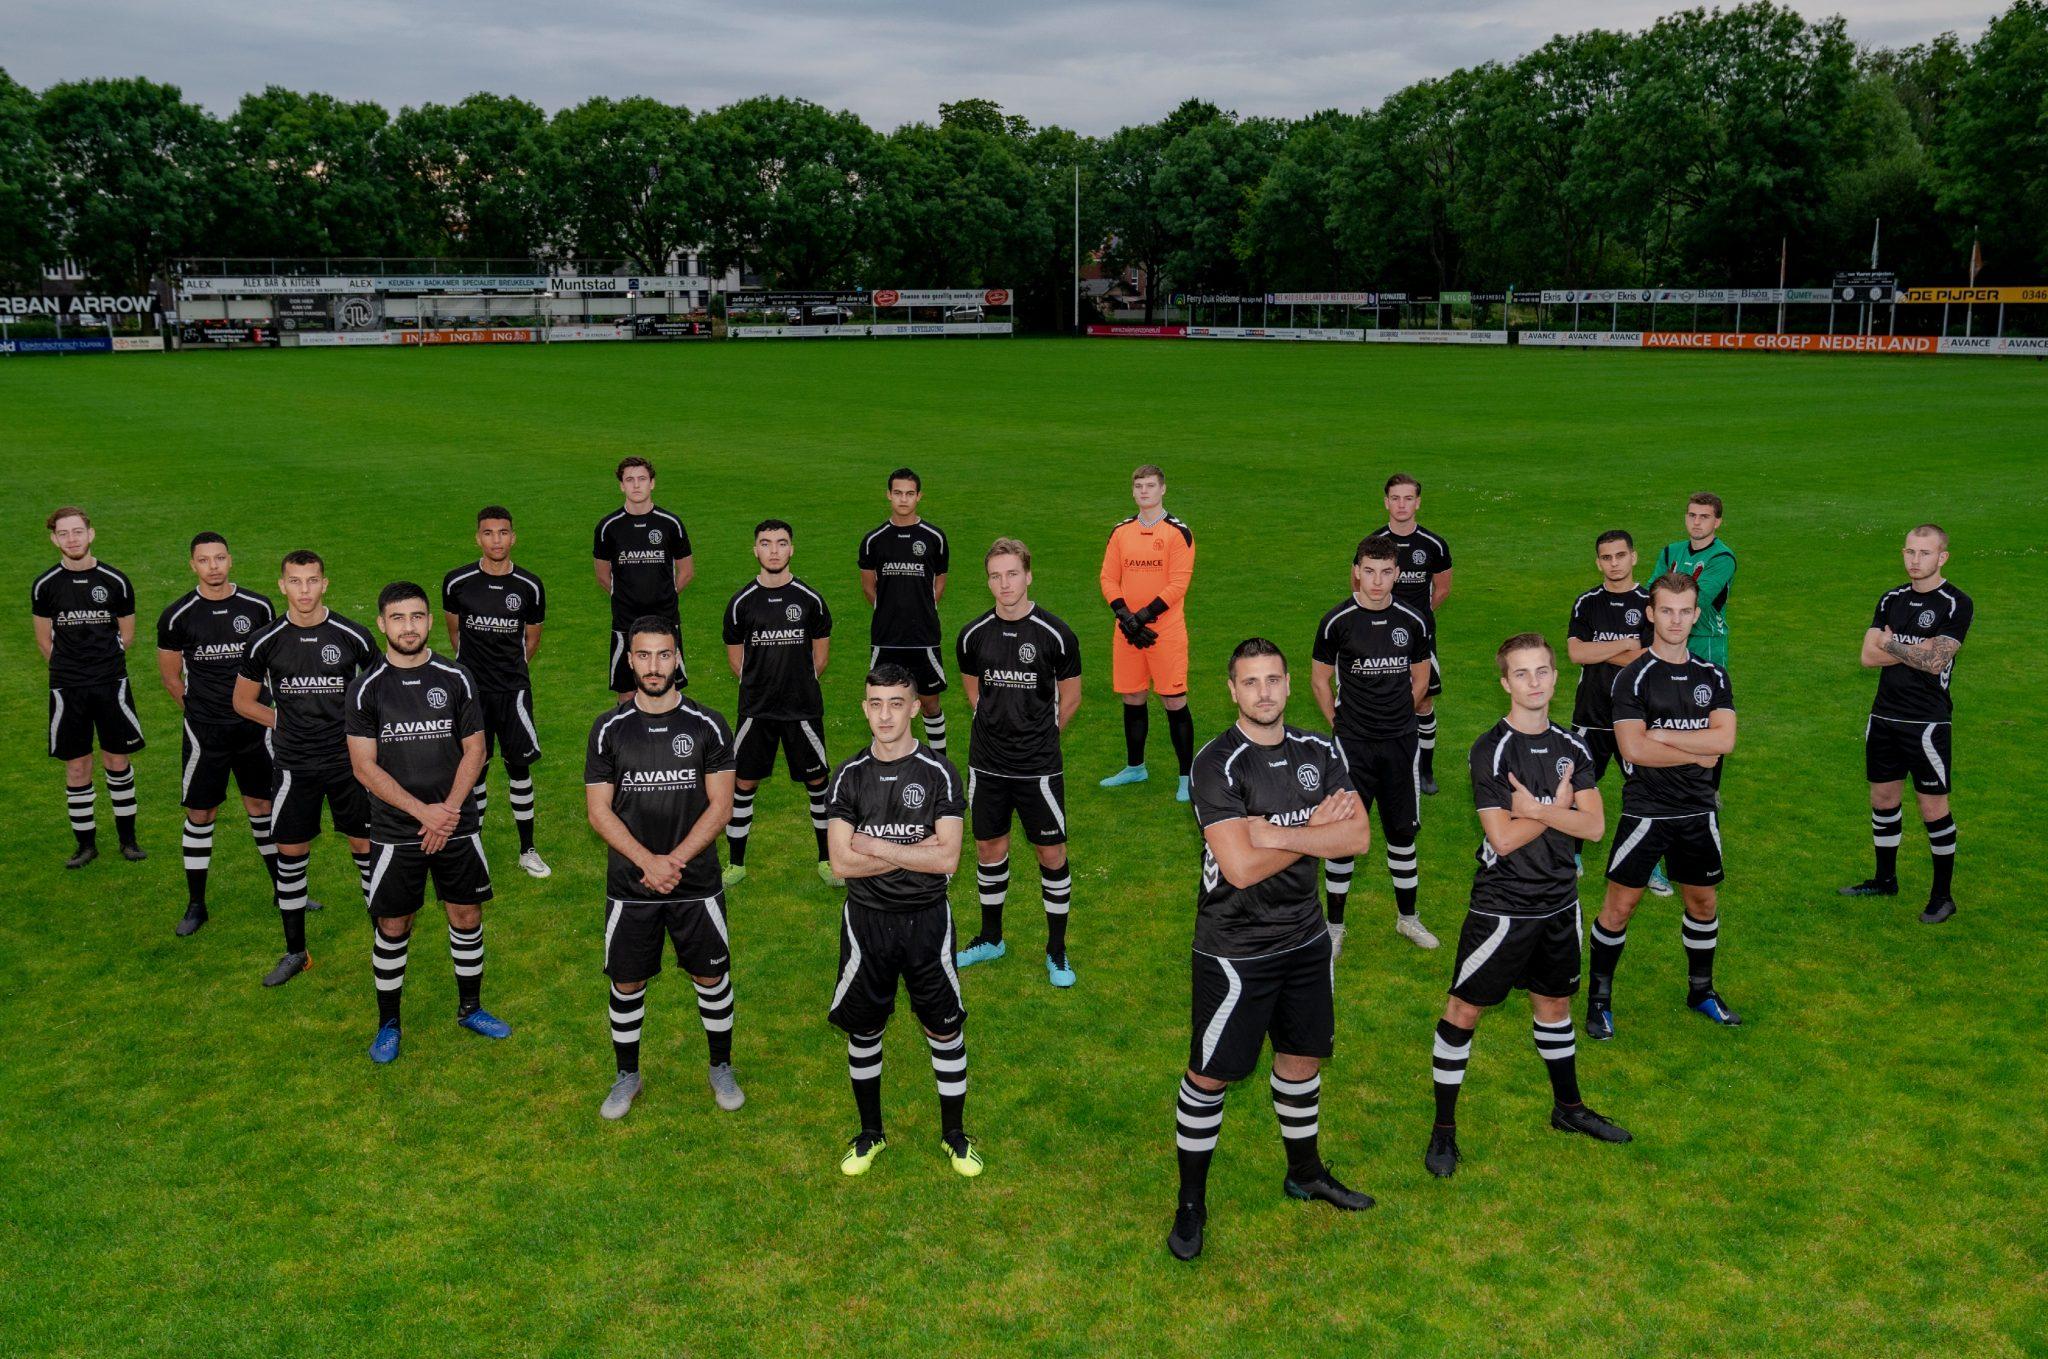 VV Maarssen start met O23-team in 4e Divisie